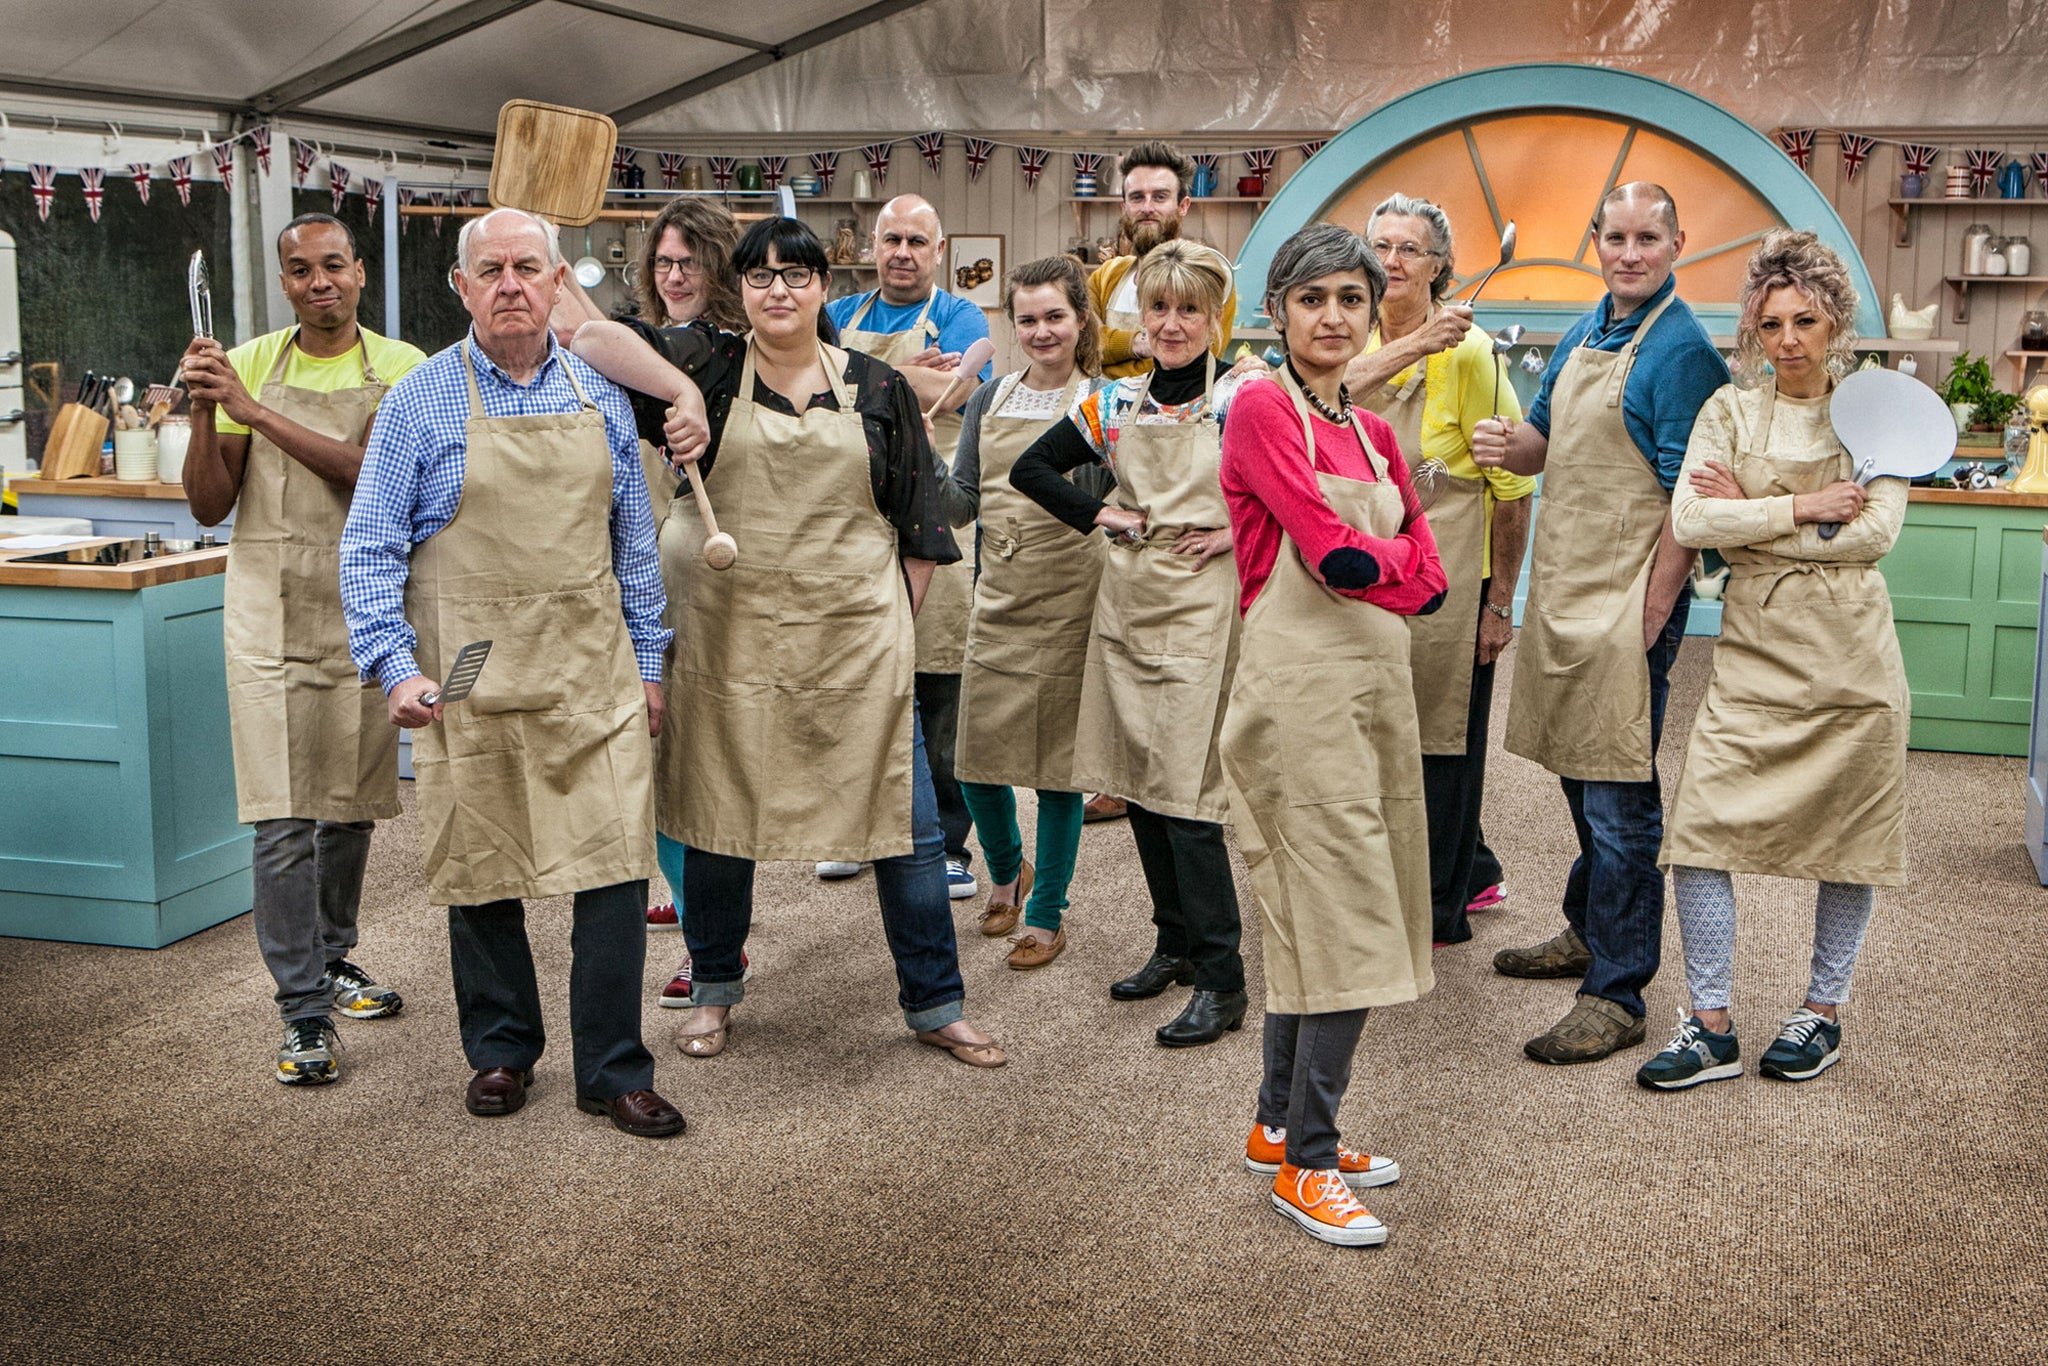 bakers dozen dating site 2016